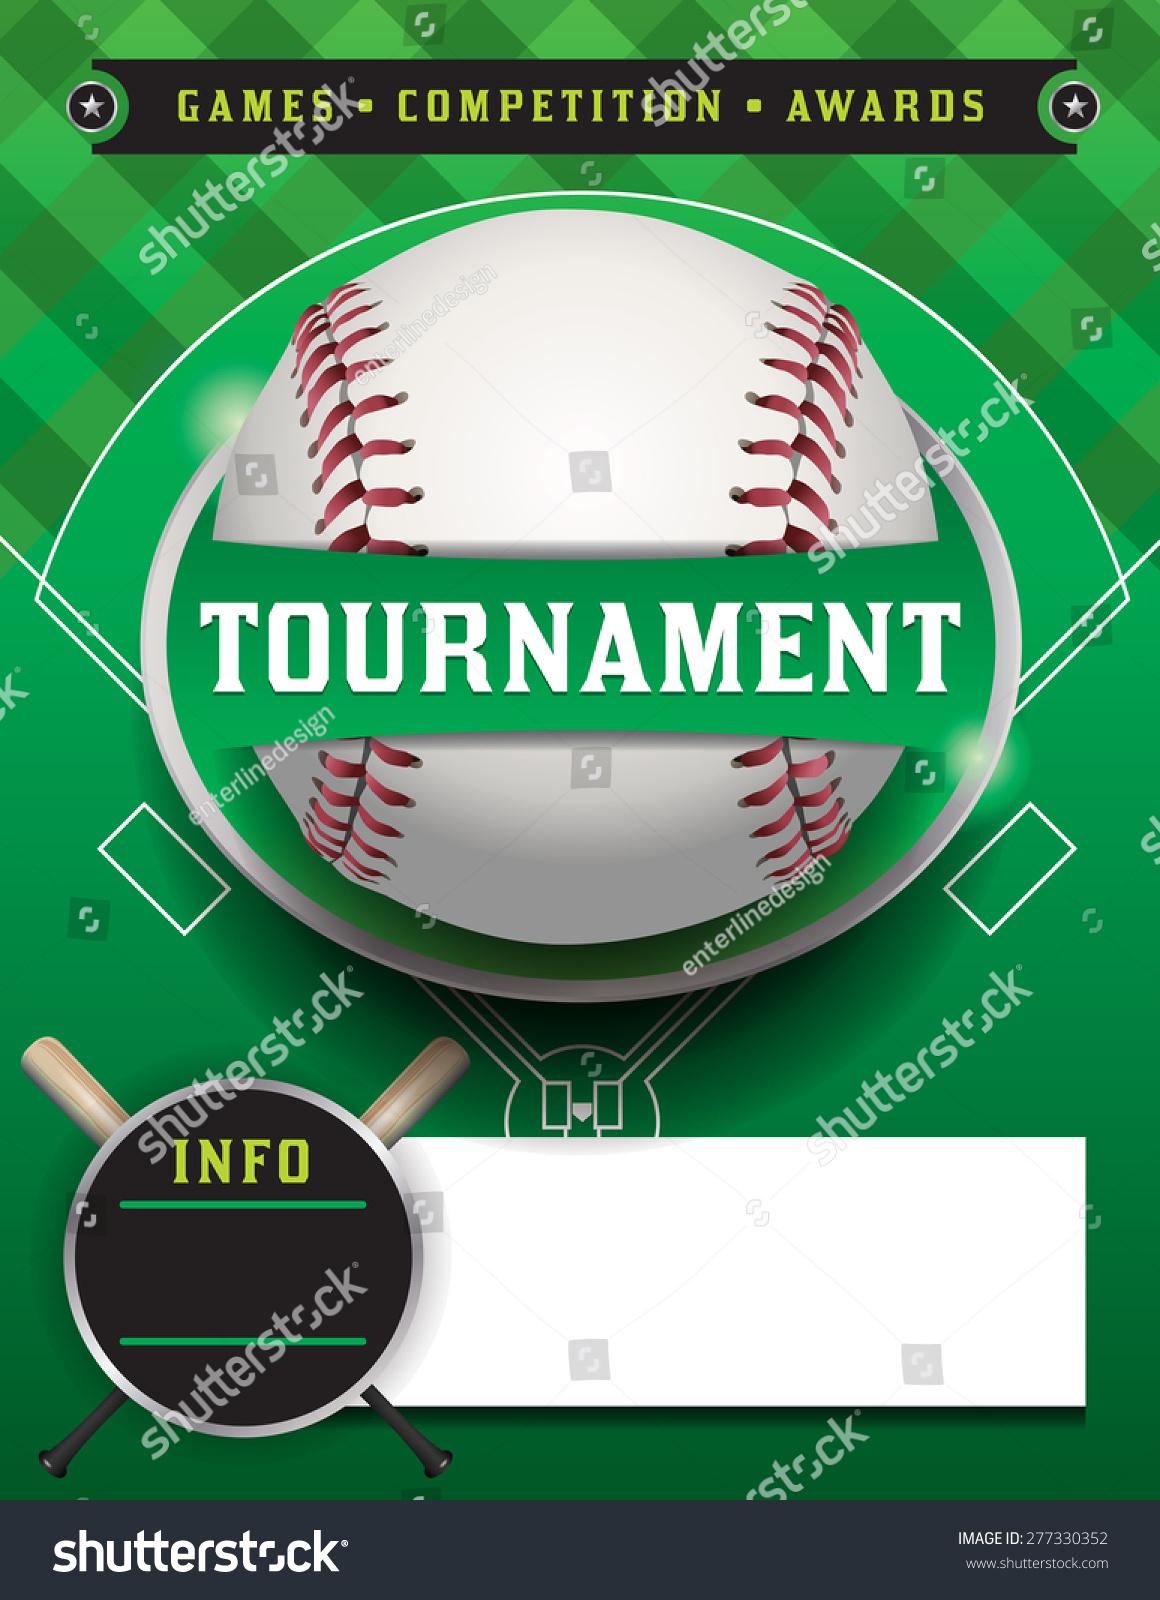 baseball tour nt flyer illustration room copy stock a baseball tour nt flyer illustration room for copy space